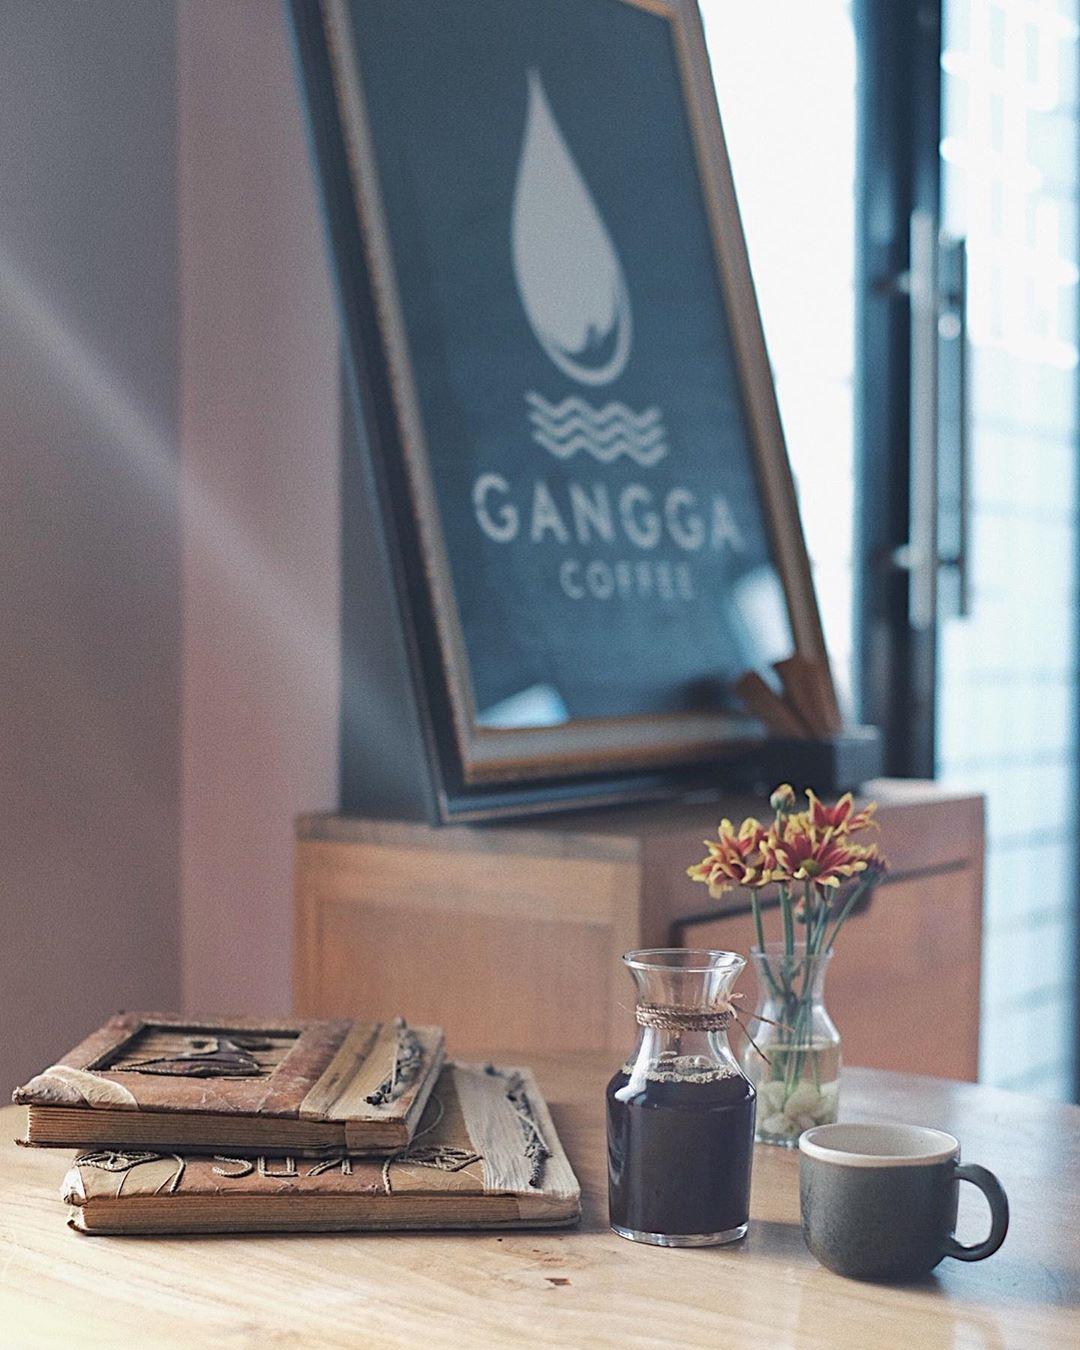 Gangga Coffee by @ganggacoffeegallery